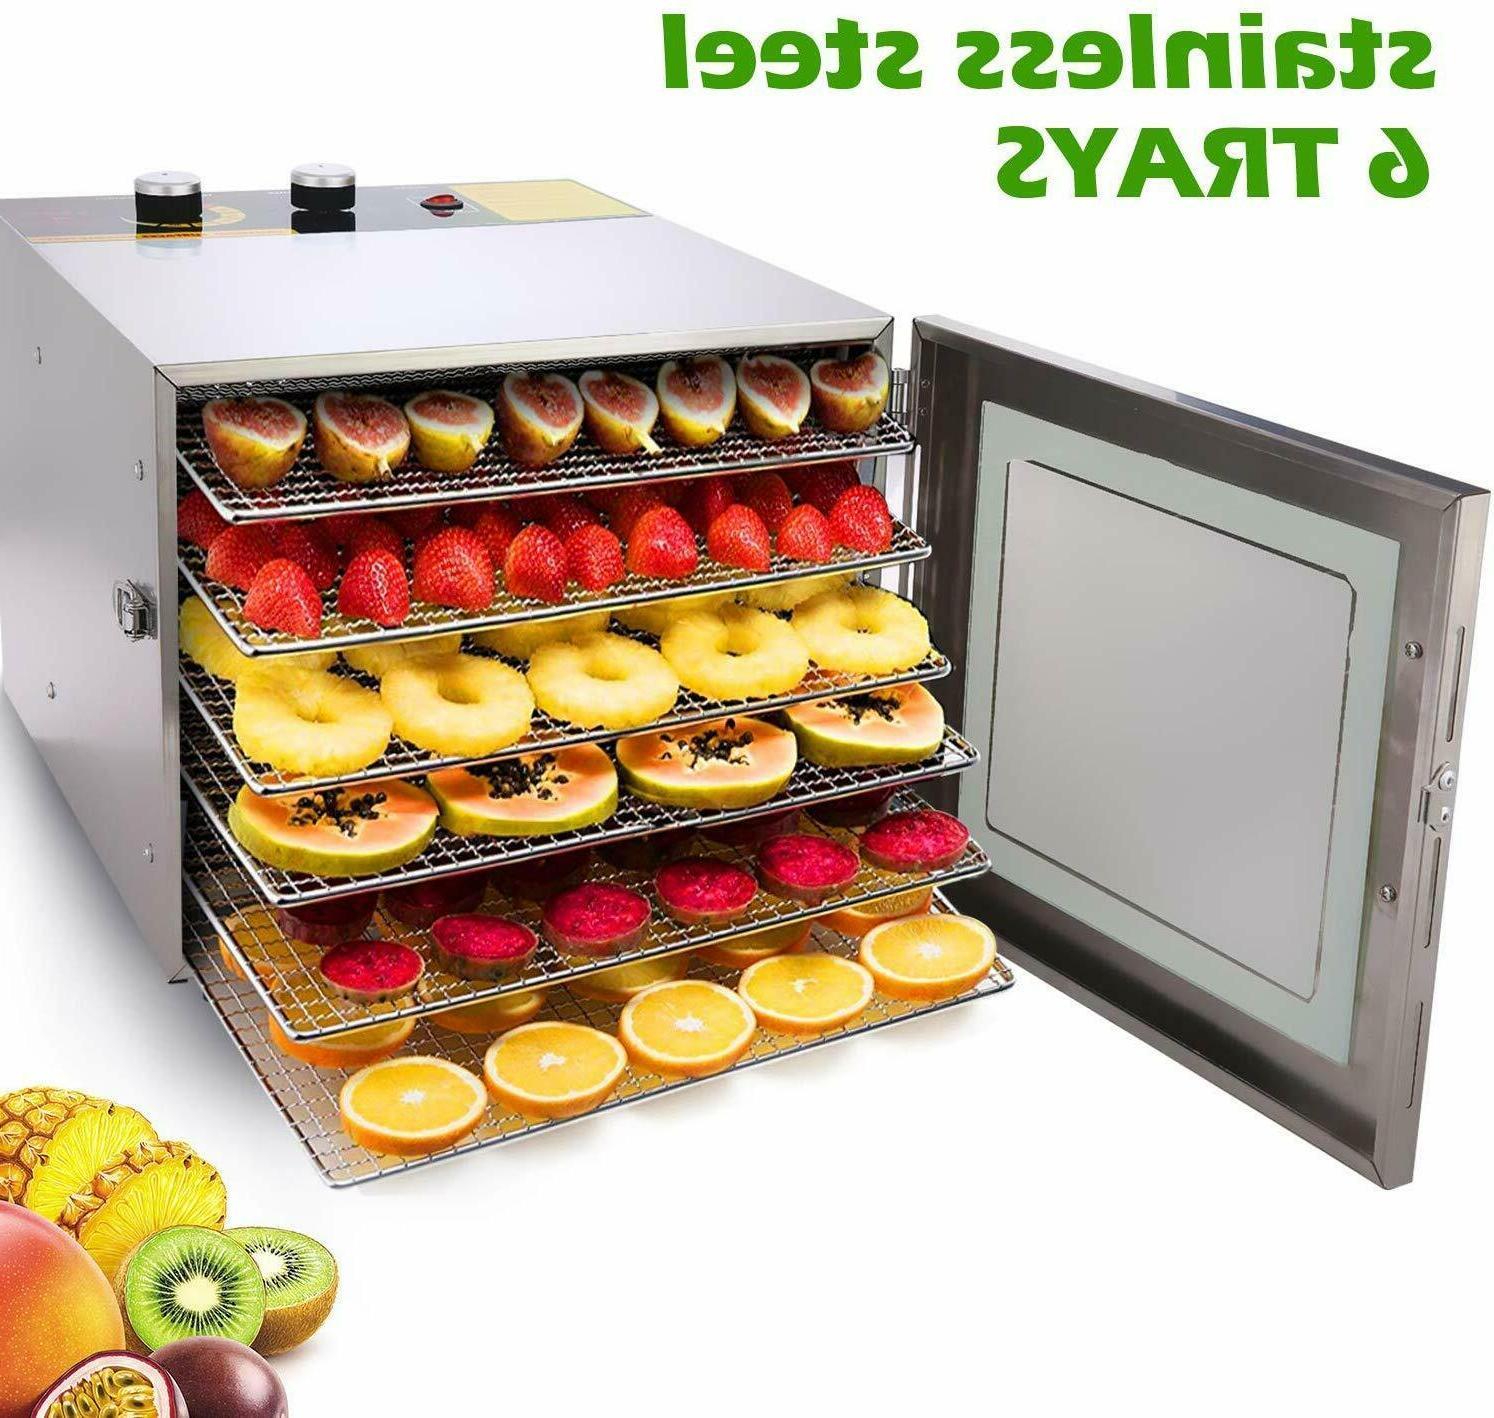 6 Tray Dehydrator Machine Stainless Steel Racks Healthy Fruit Jerky US